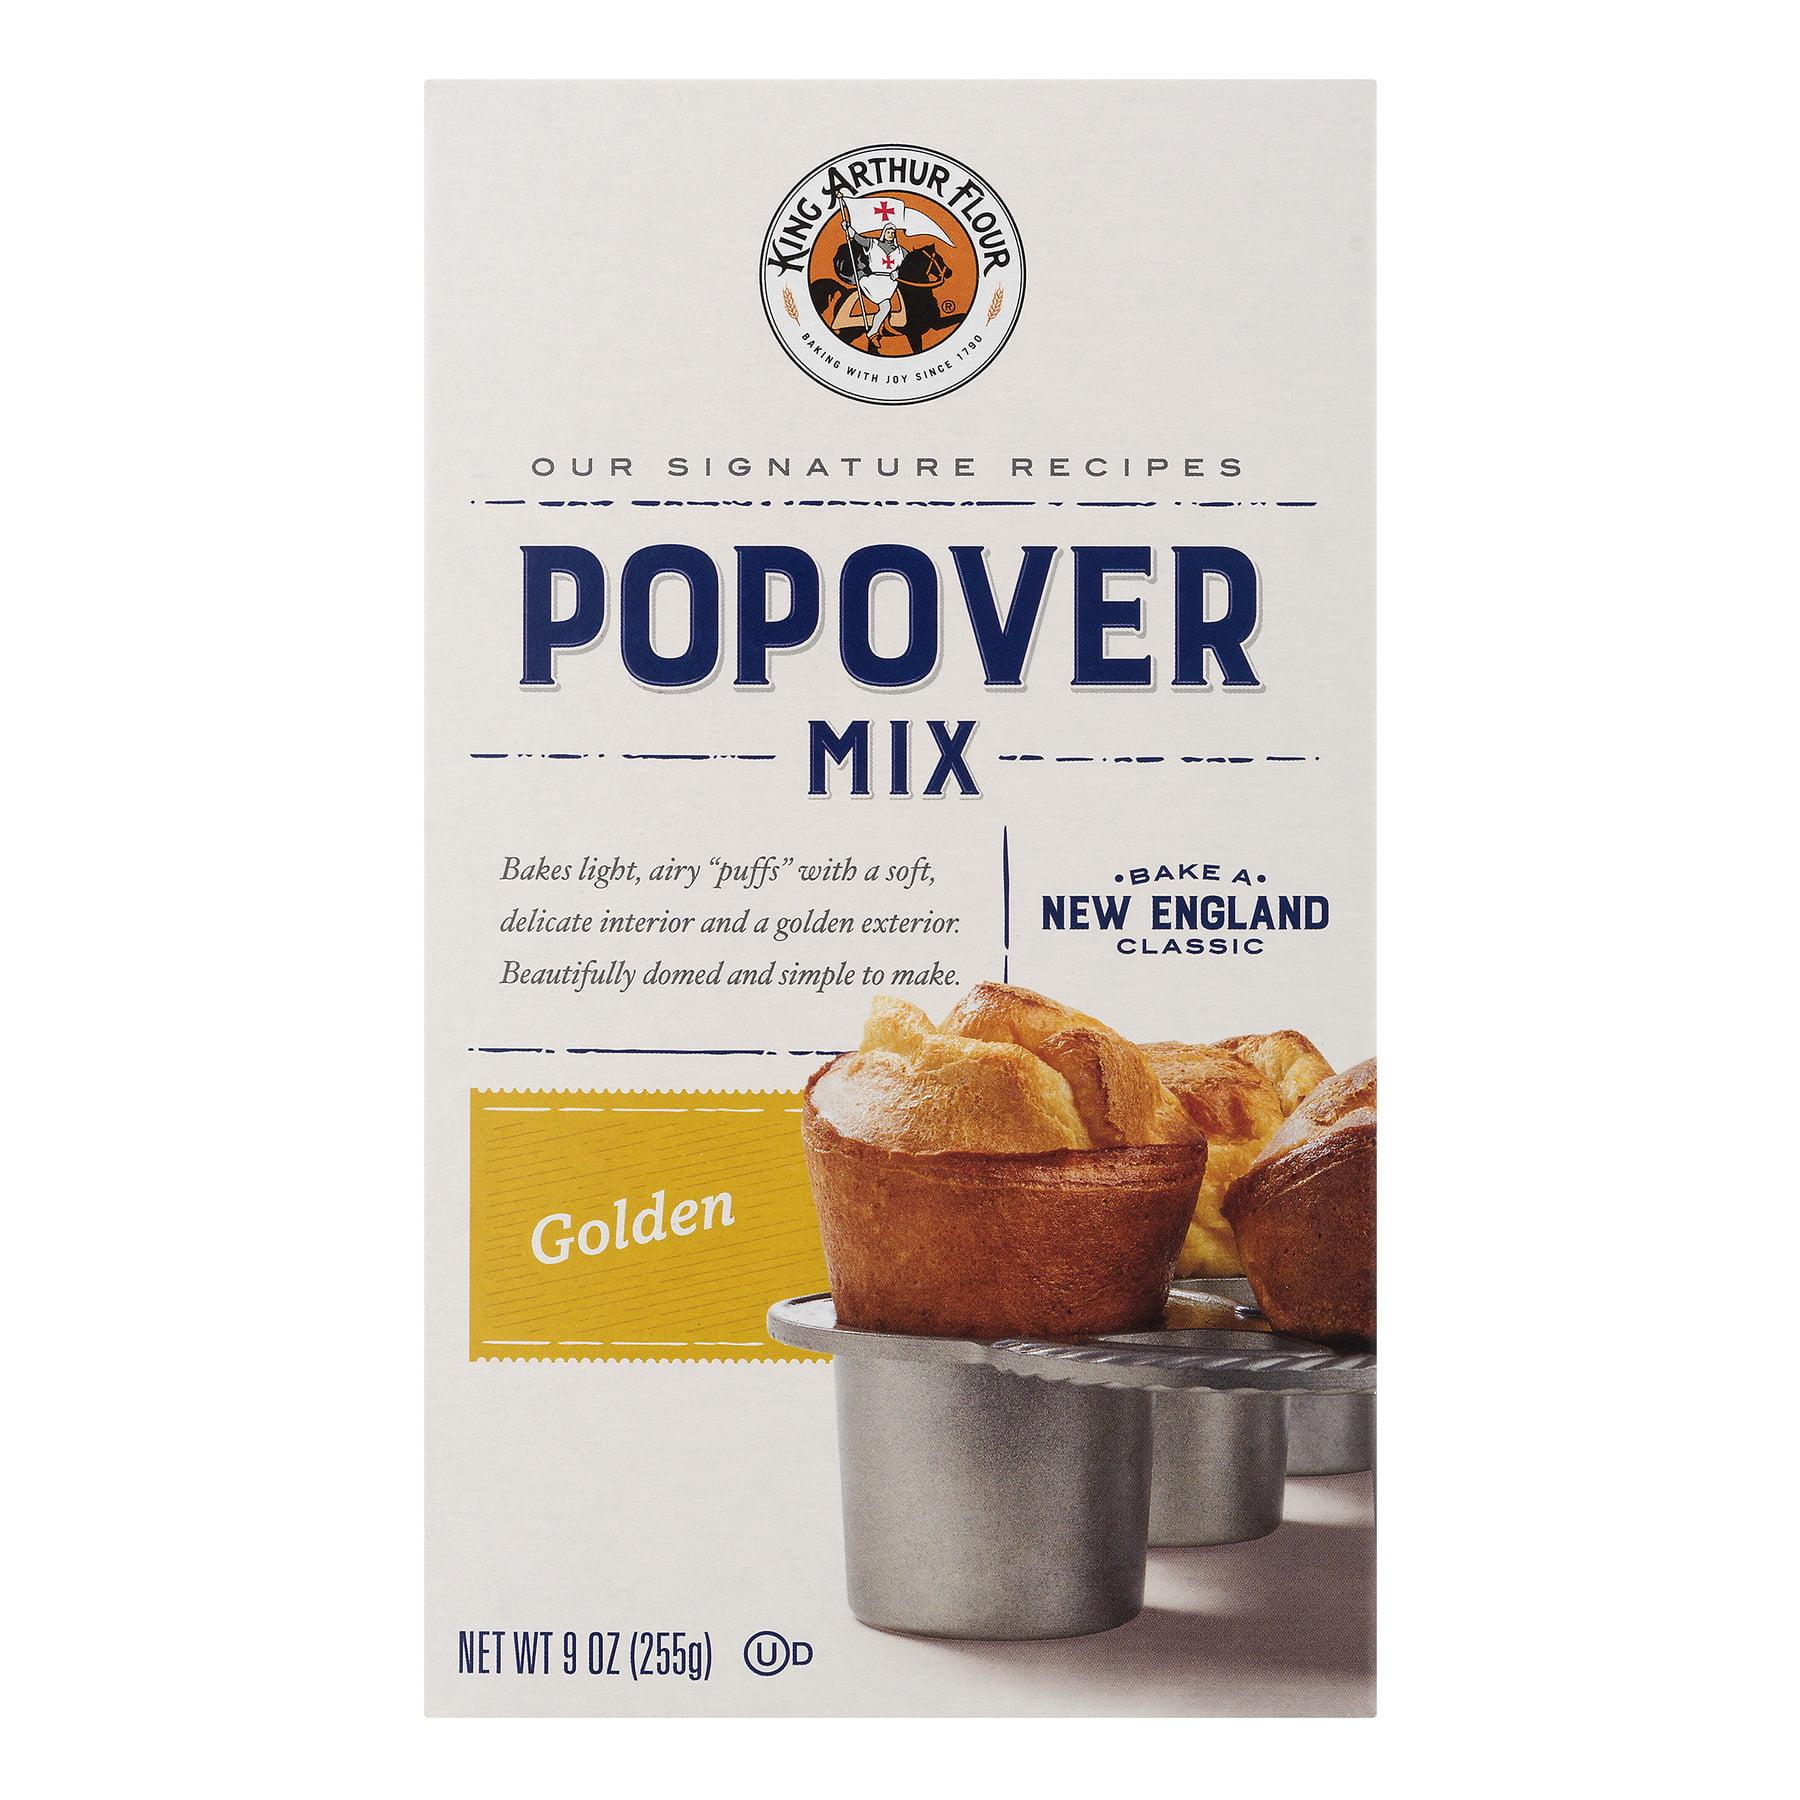 King Arthur Flour Popover Mix Golden, 9.0 OZ